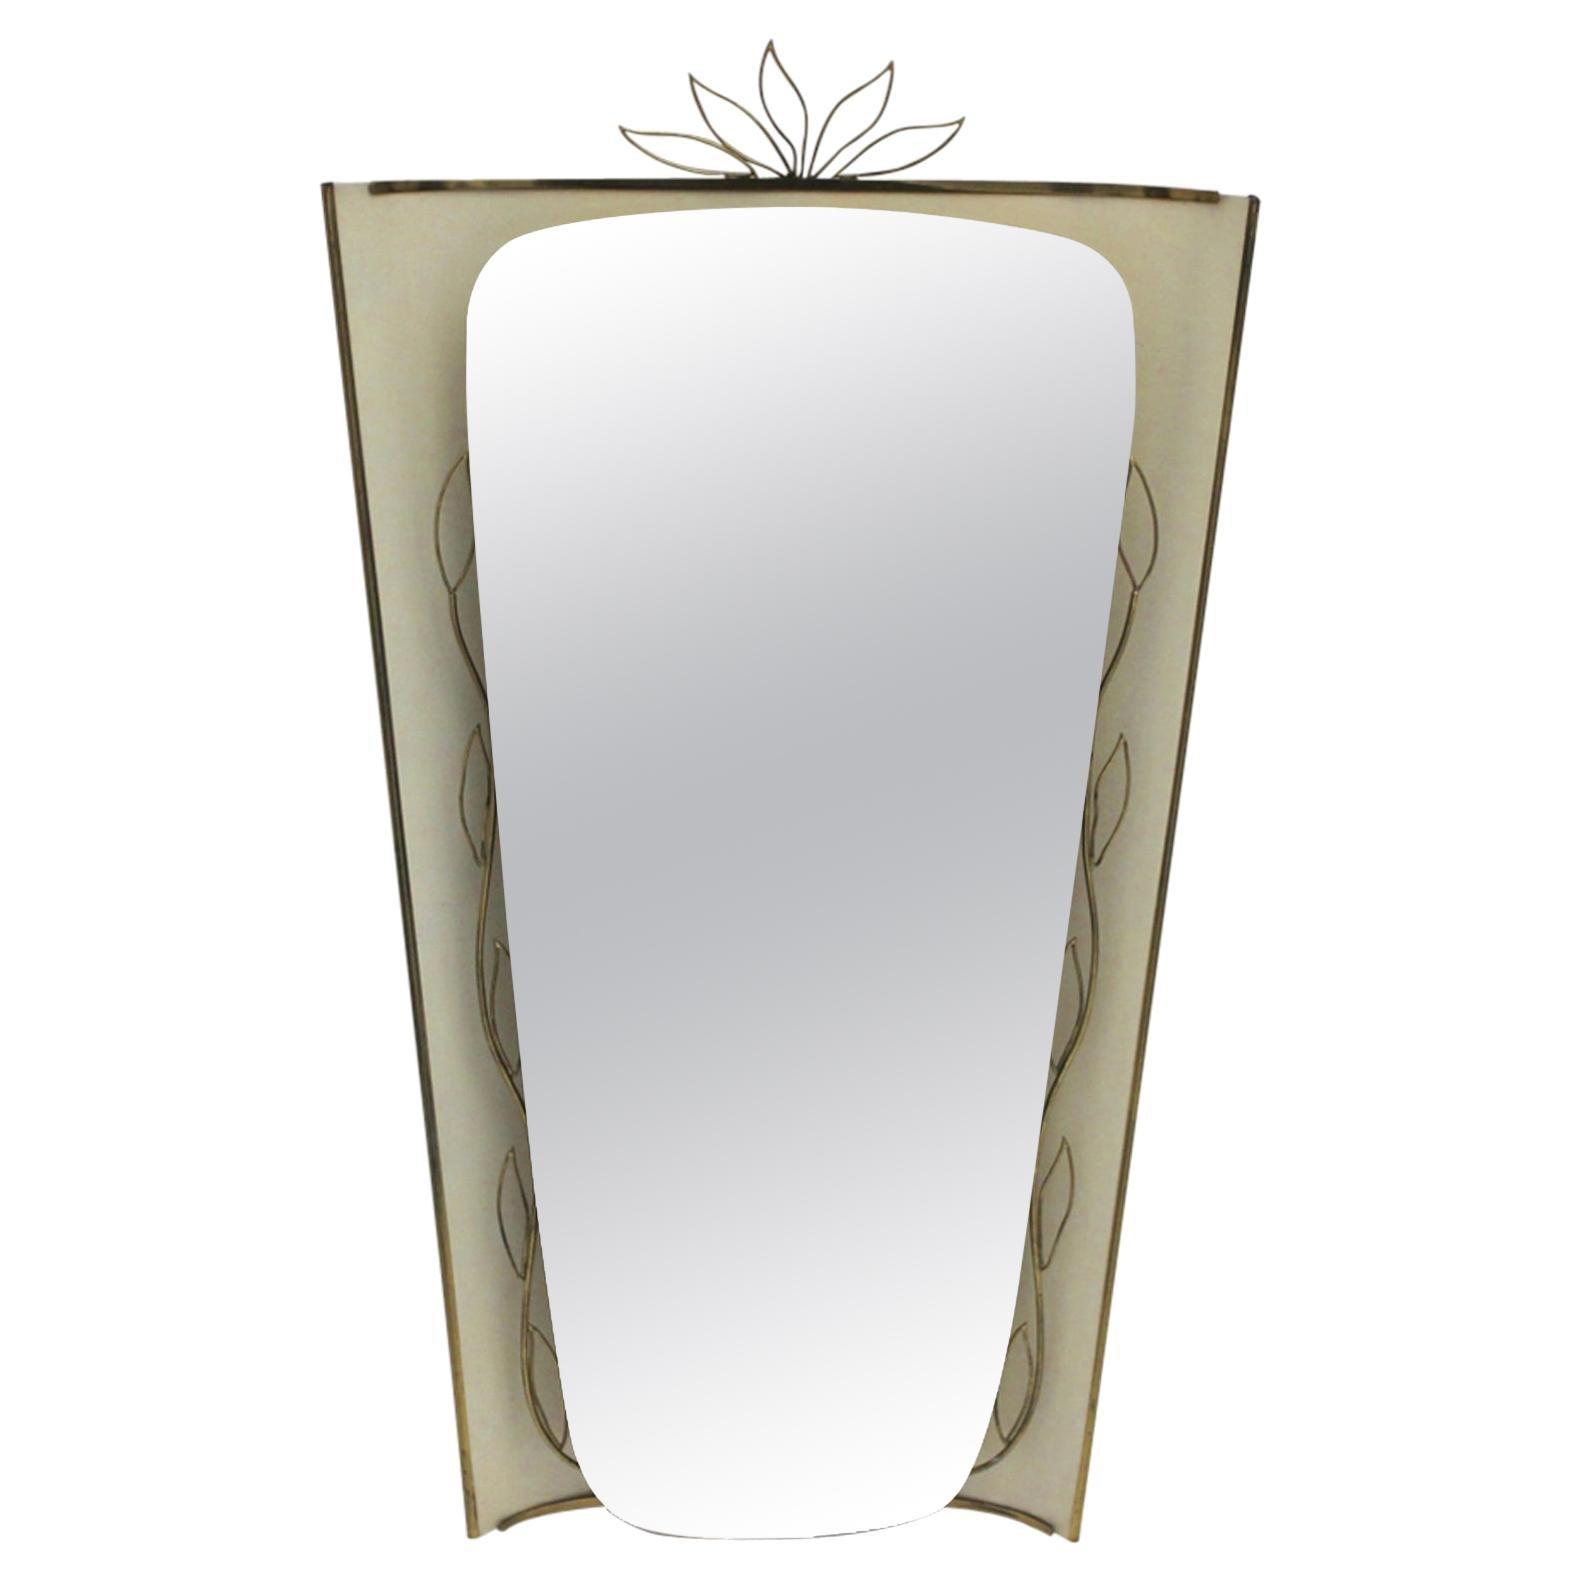 Mid-Century Modern Vintage Wall Mirror Floor Mirror Style Gio Ponti, 1950, Italy